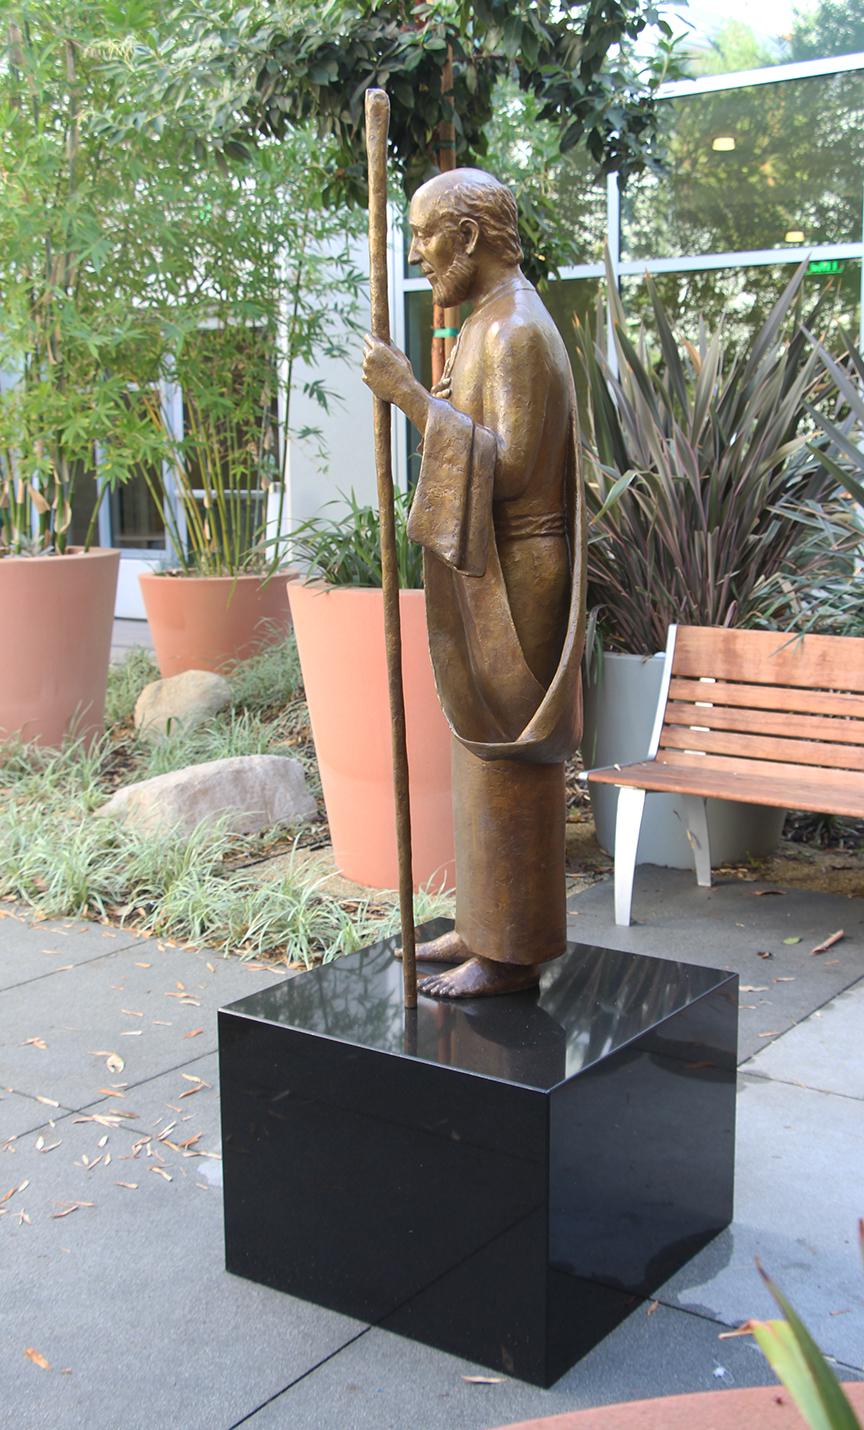 St. Jude in Healing Garden, St. Jude Medical Center